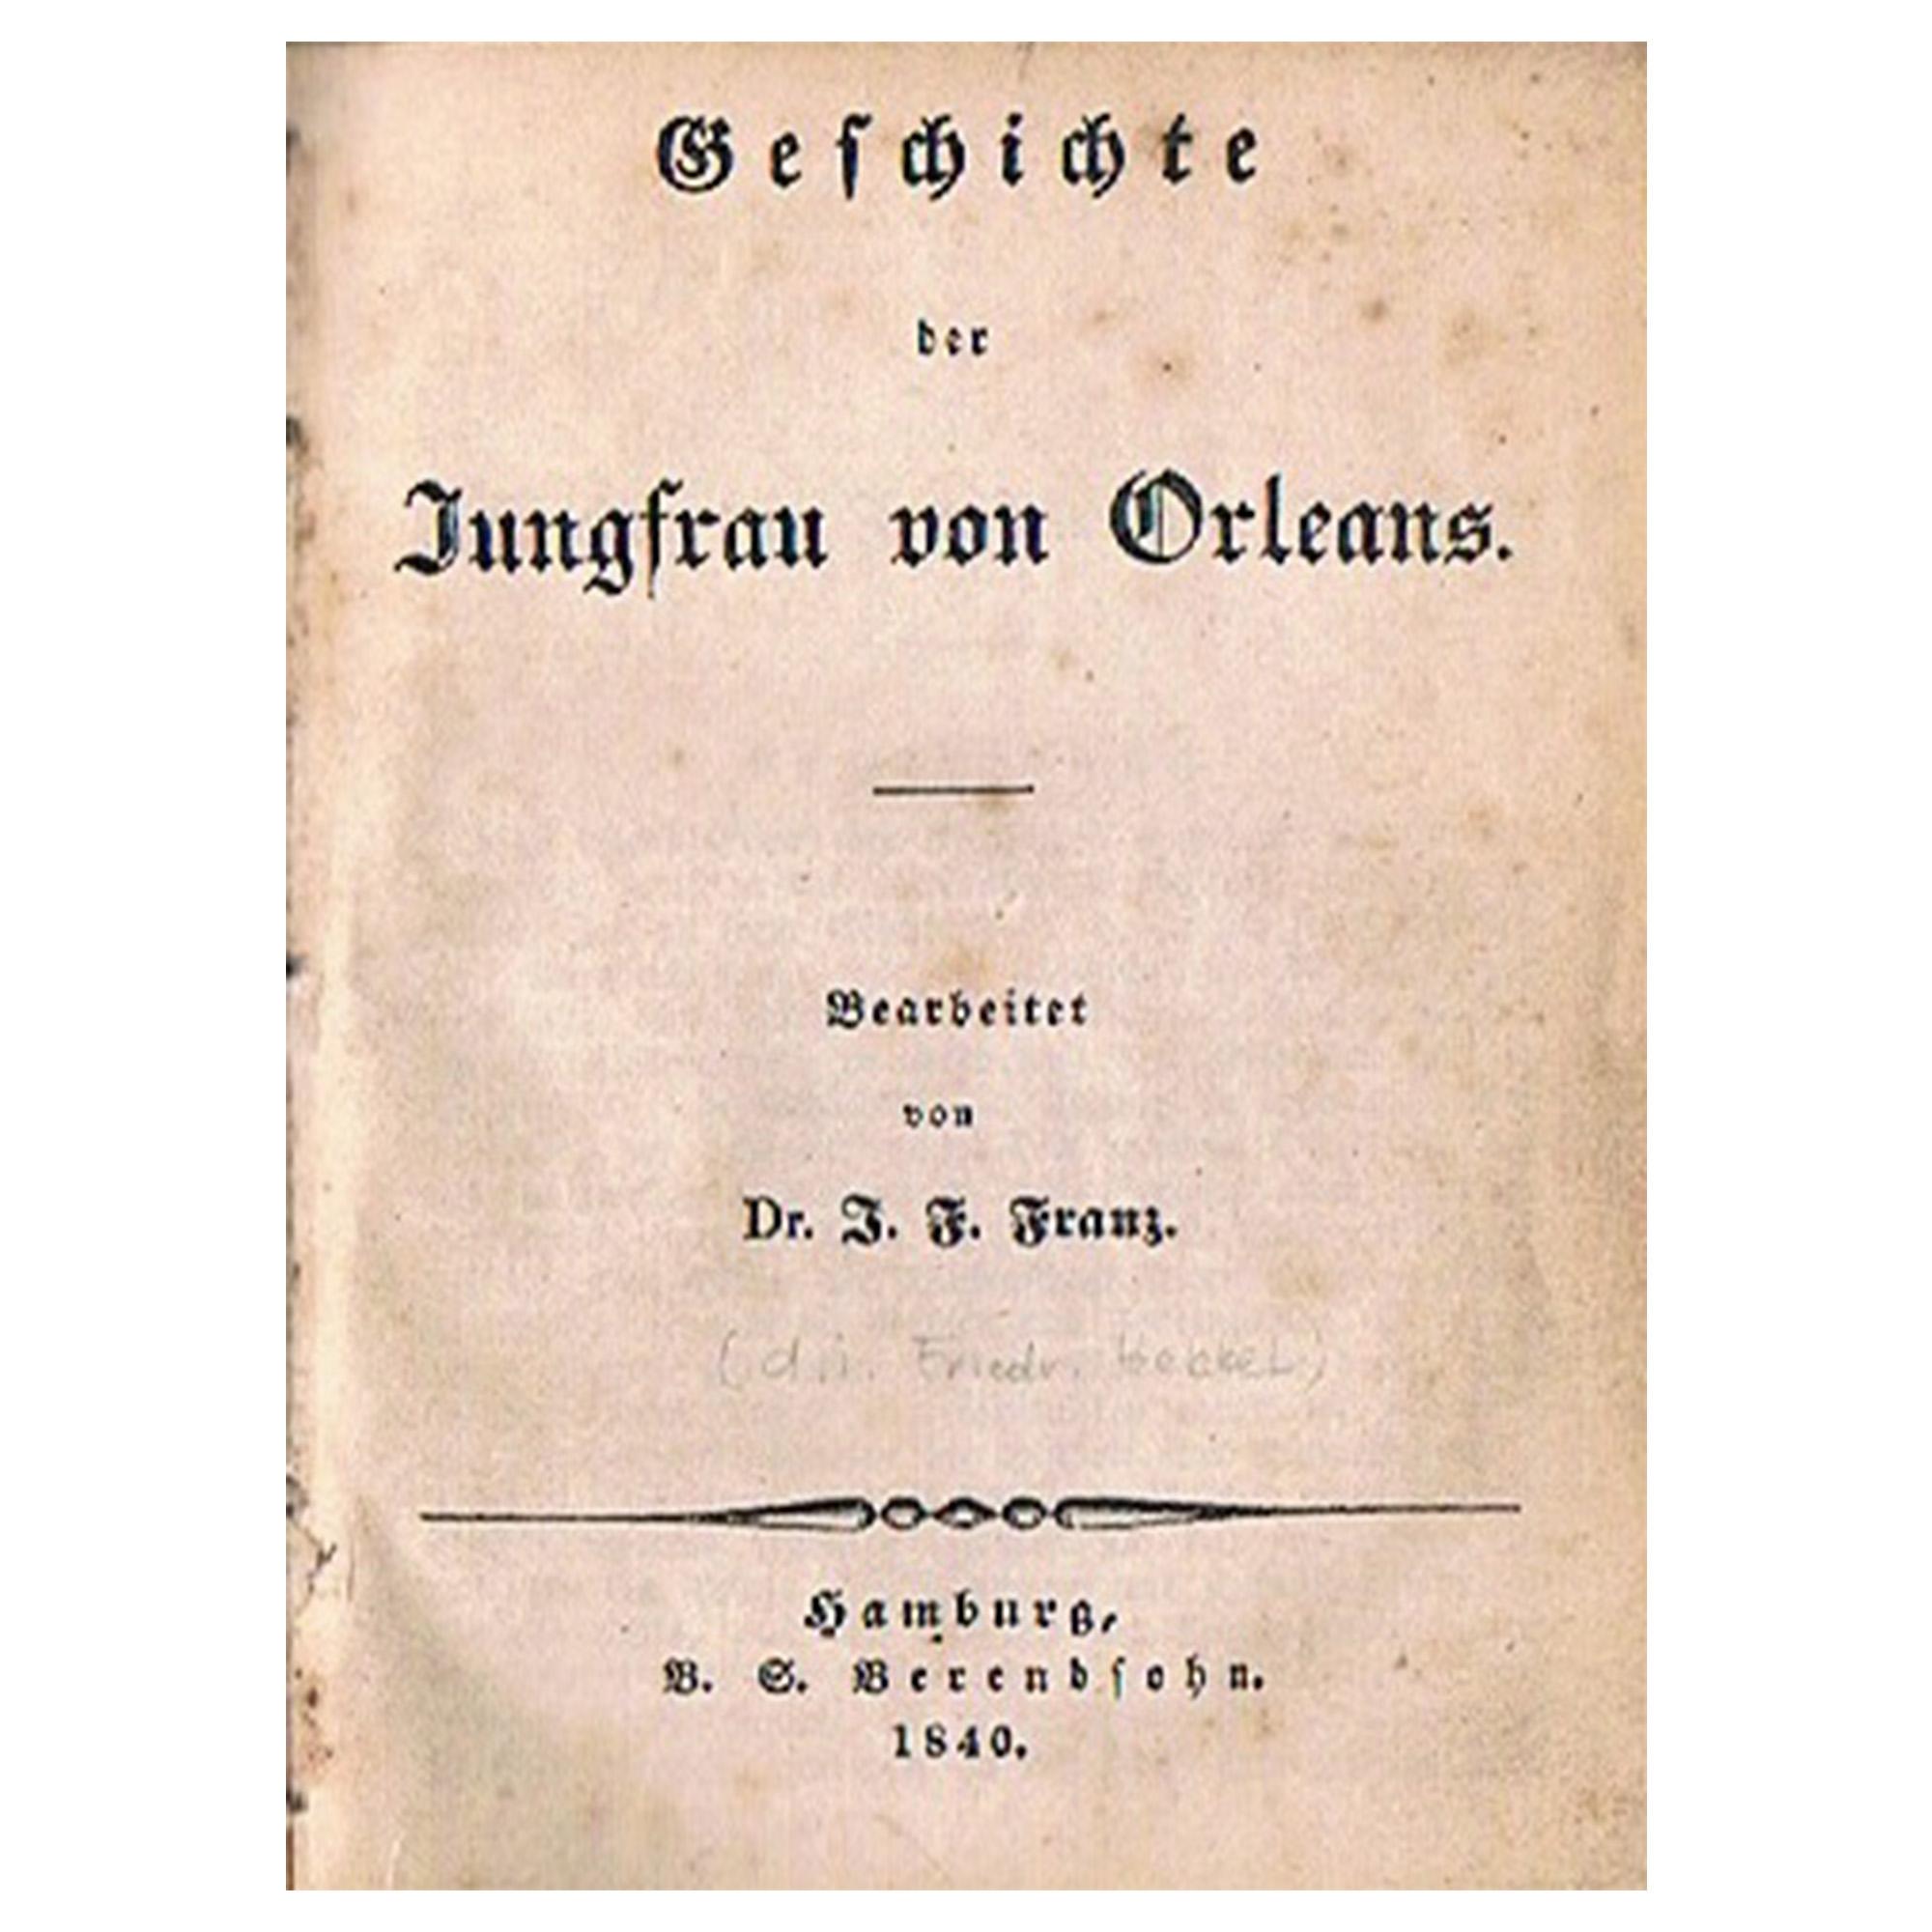 1097-Hebbel-Orleans-1840-Titbl_.jpg